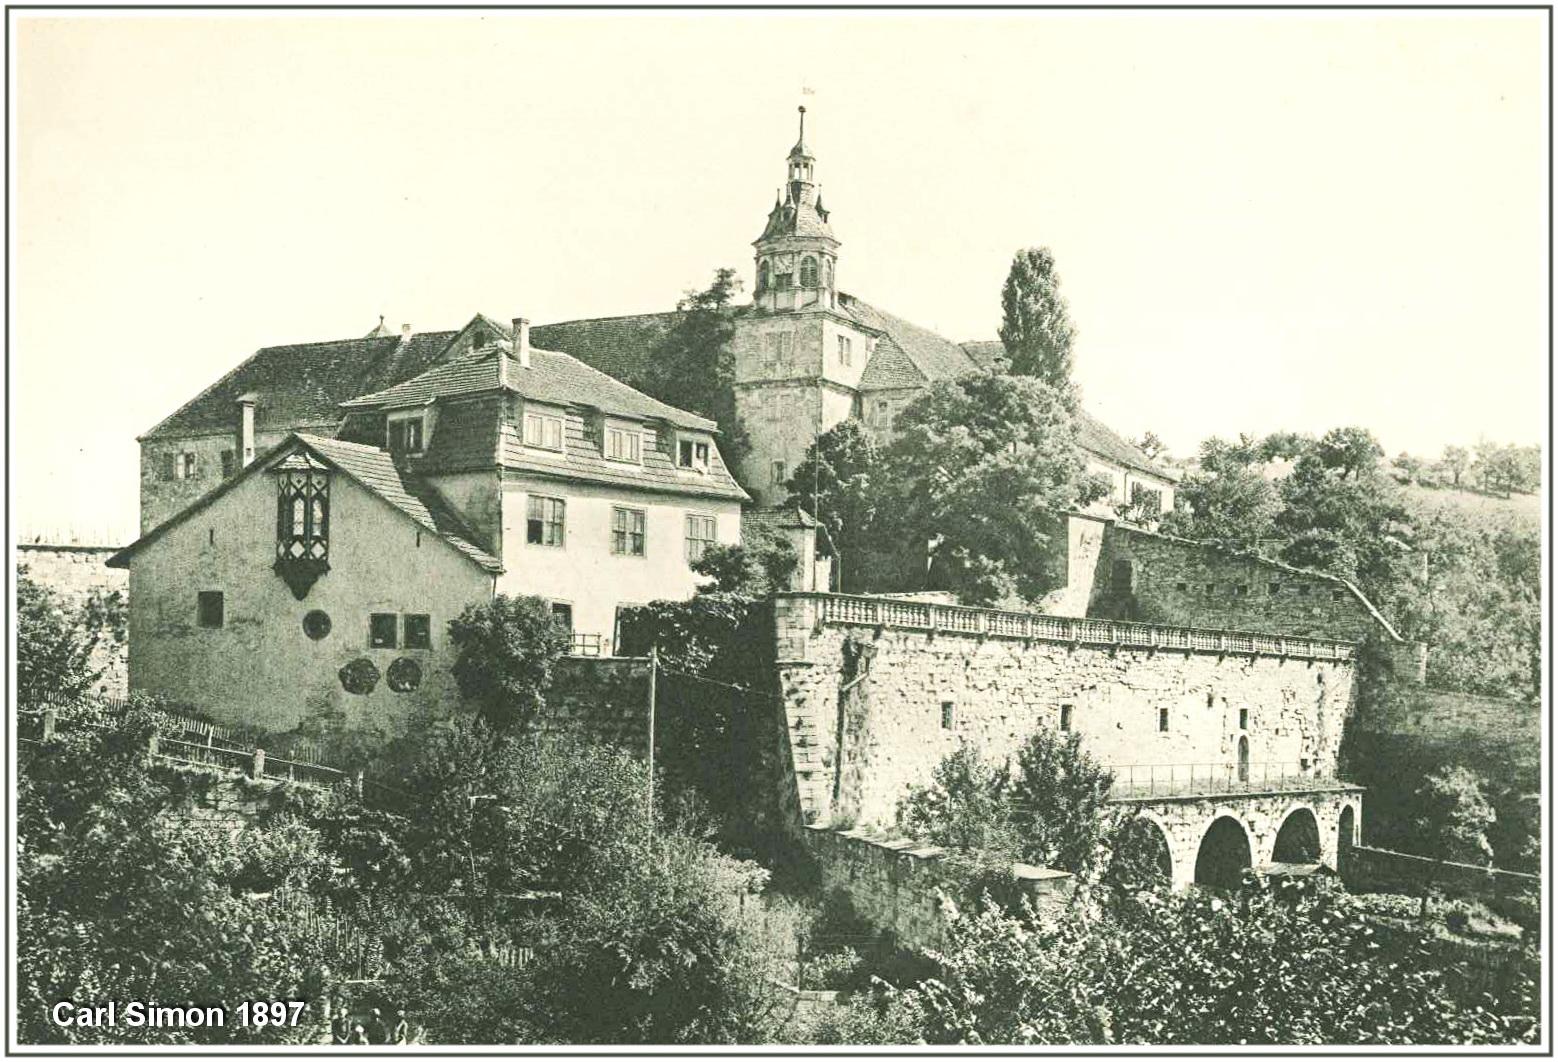 BildKarussell-SchlossWilhelmsburg.CarlSimon.1897